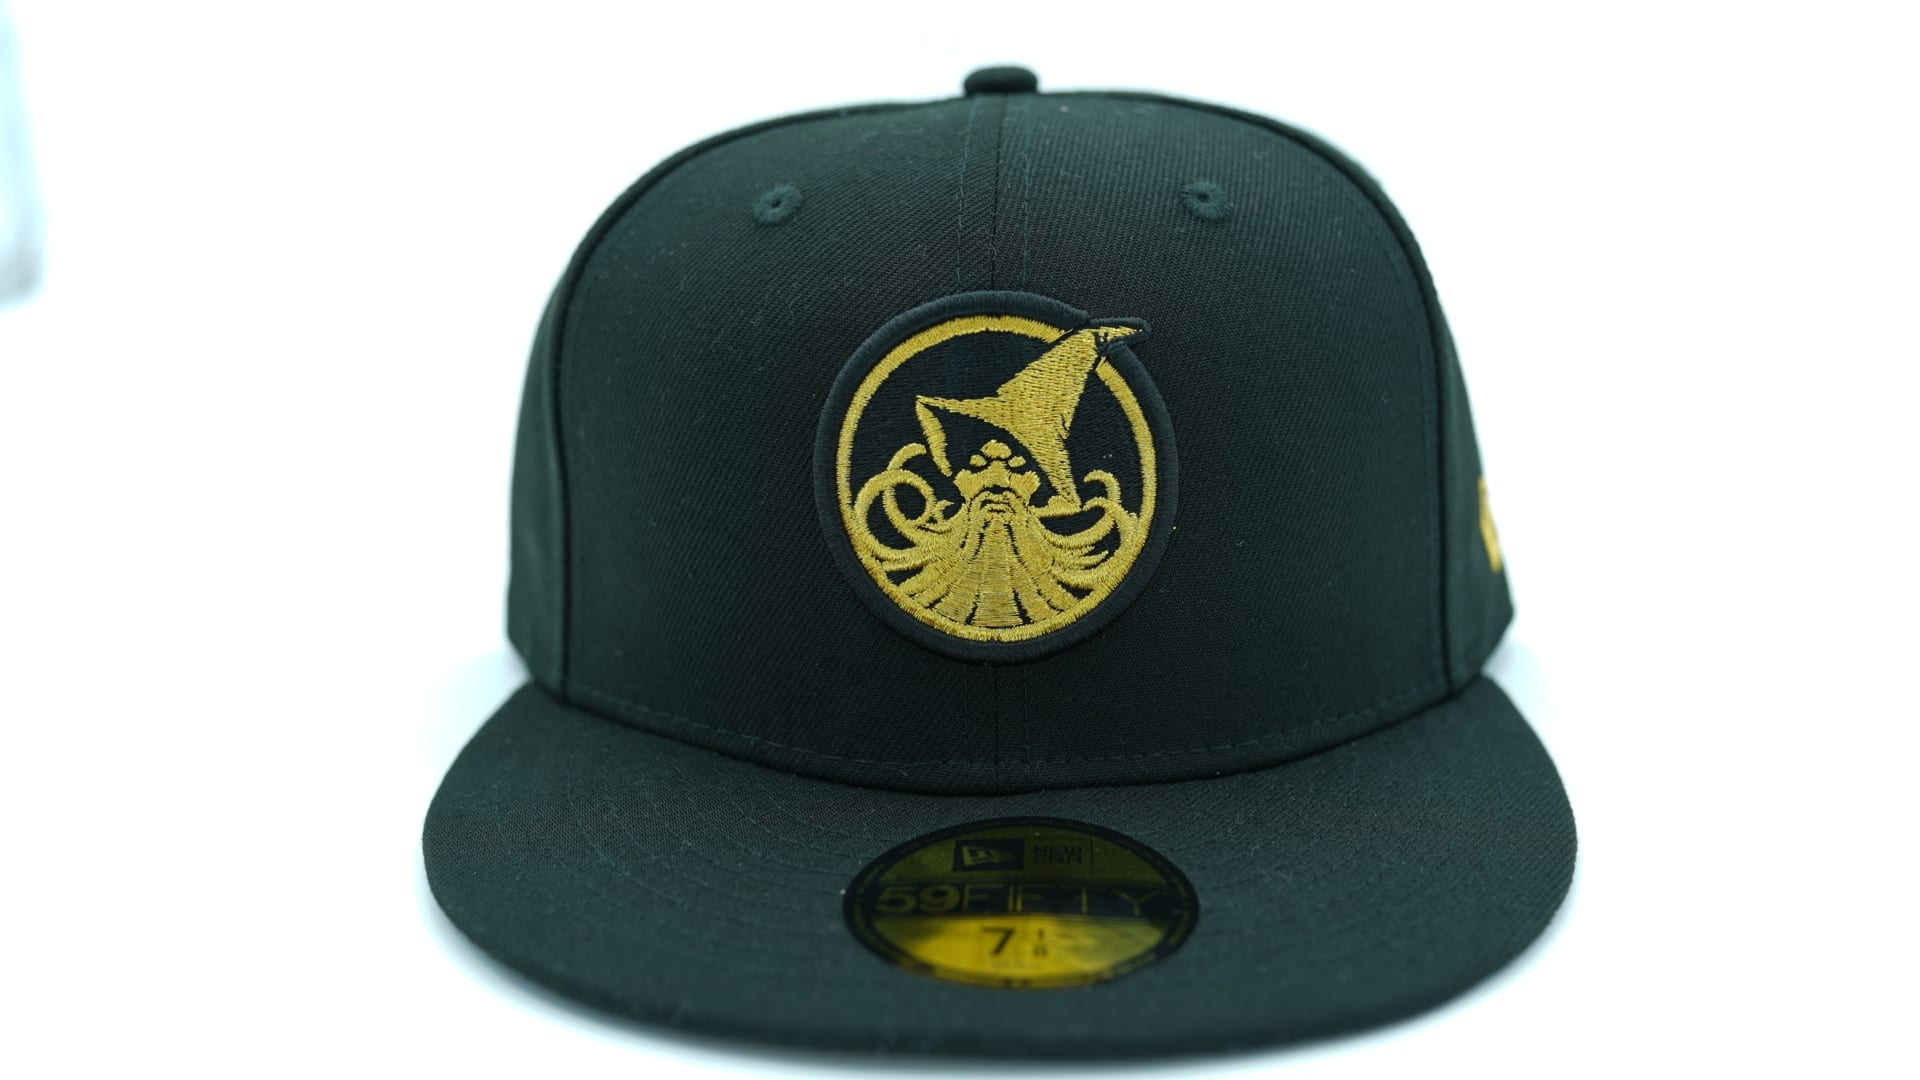 a40b4339f50c99 ... clearance new era flag logo flawless 59fifty fitted baseball cap new era  96ed8 1d5d6